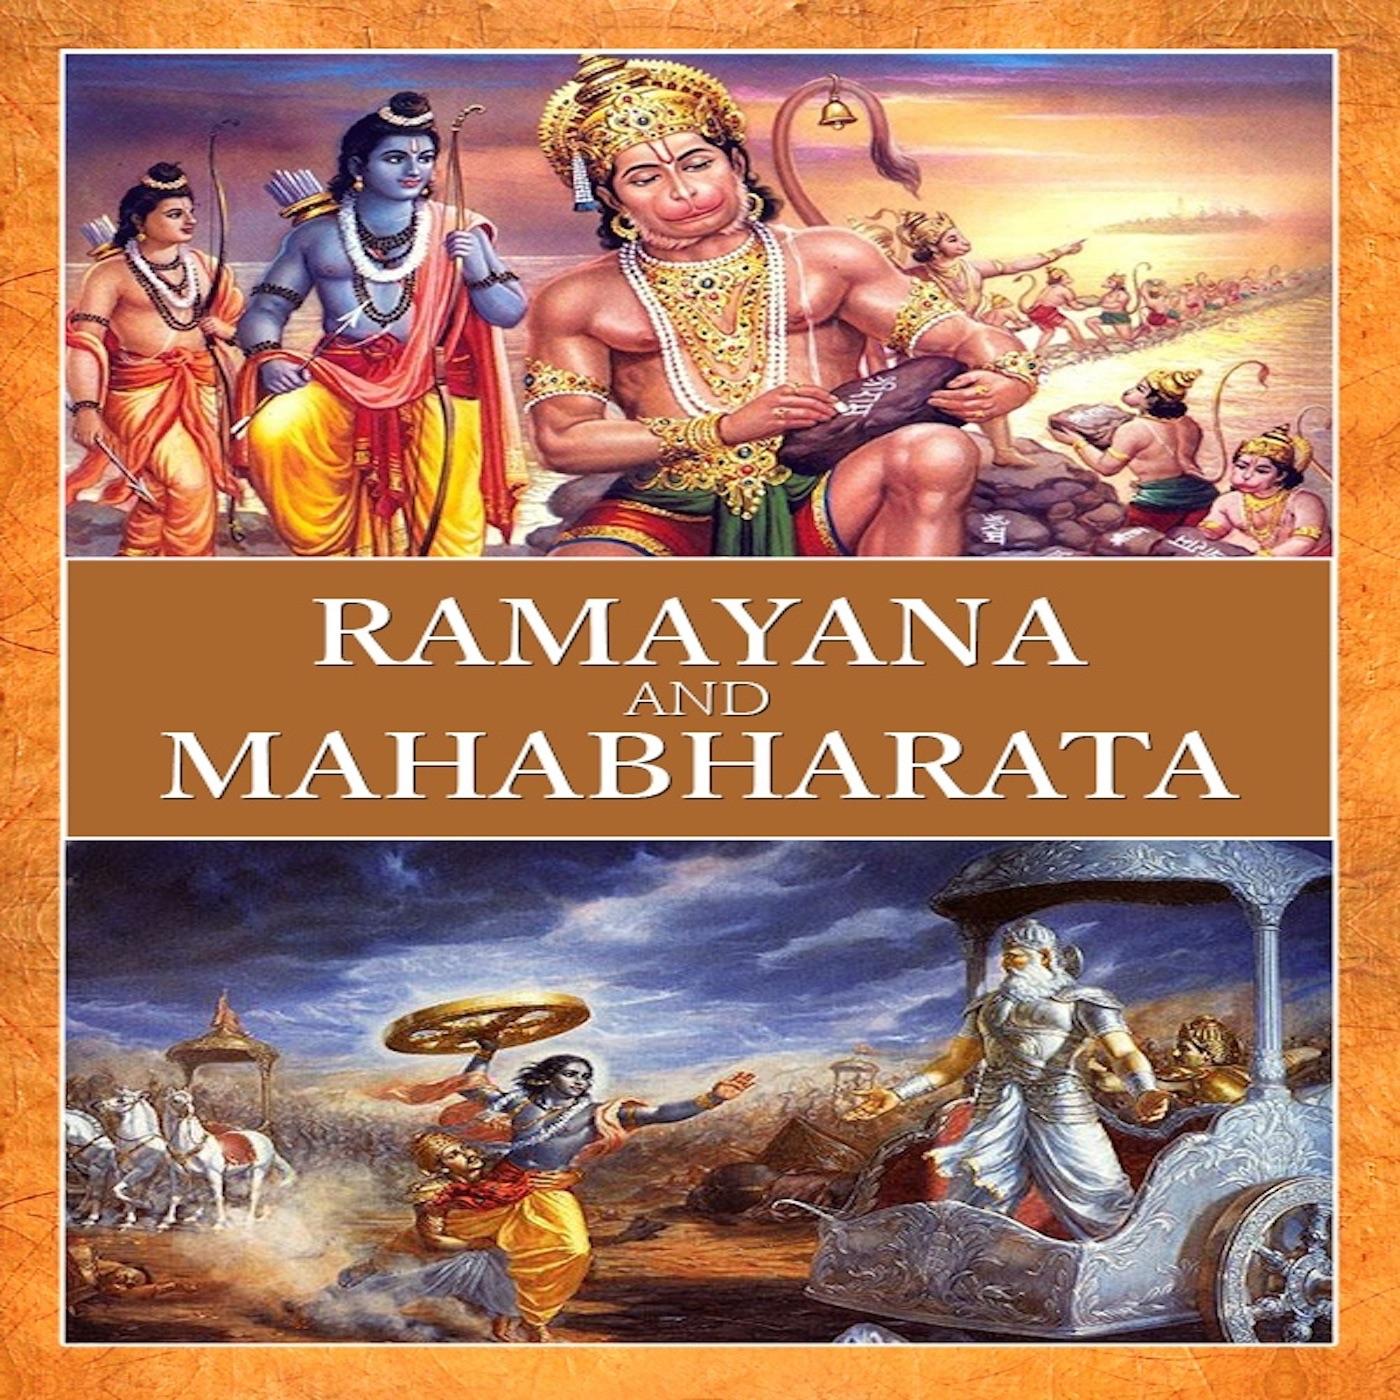 Write about the two epics ramayana and mahabharata epics